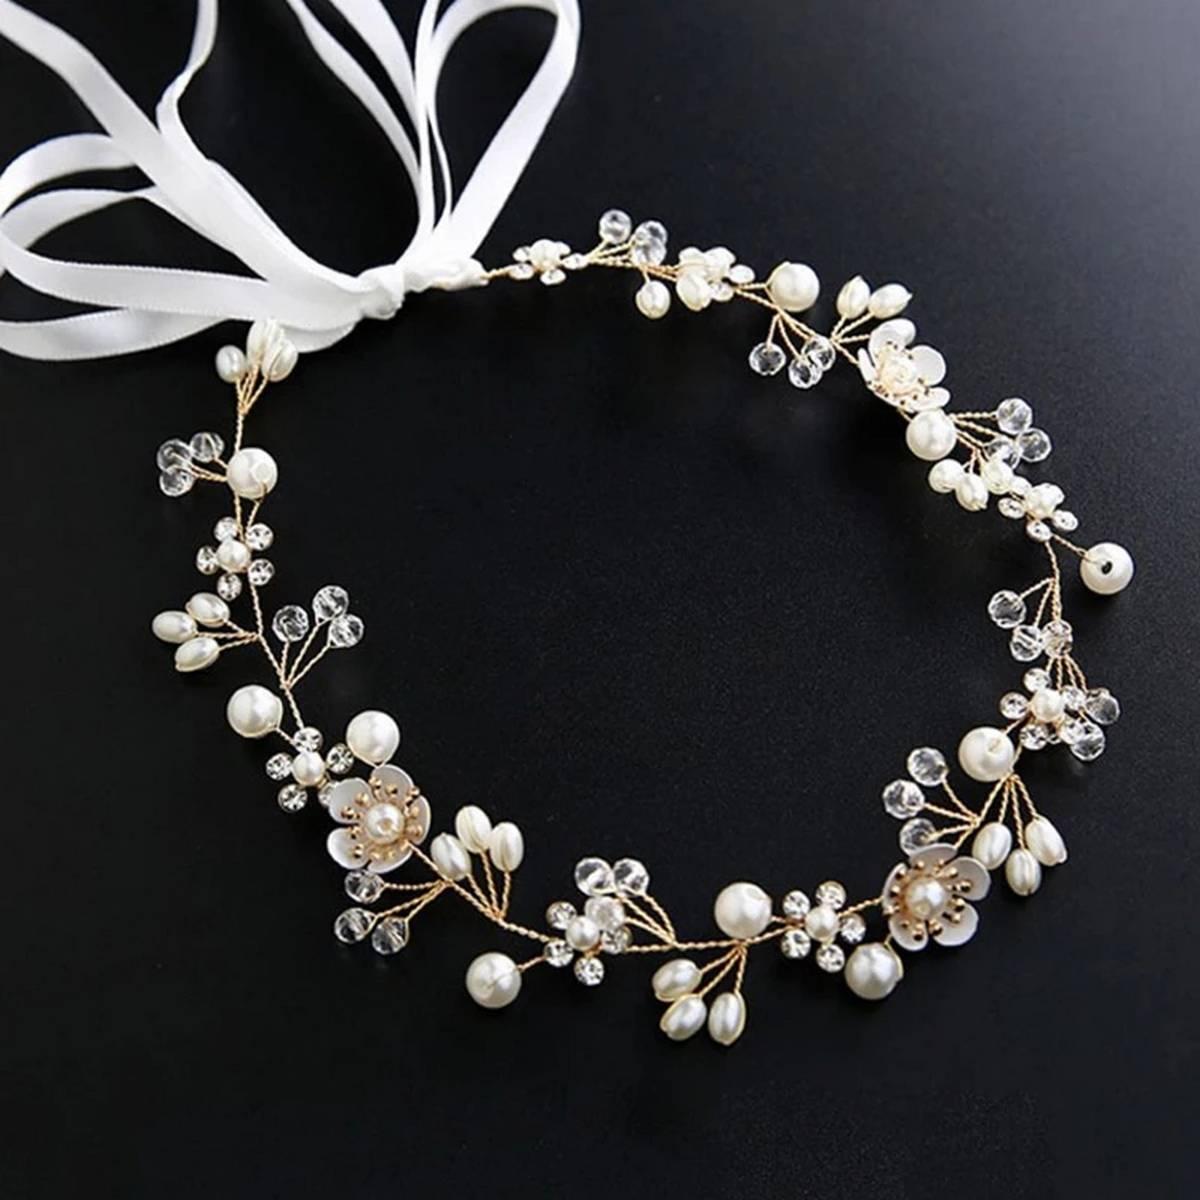 Headbands Bride Headpiece Tiaras Fashion Hair Jewelry Crystal Pearl Flower Bridal Wedding Hair Accessories For Women